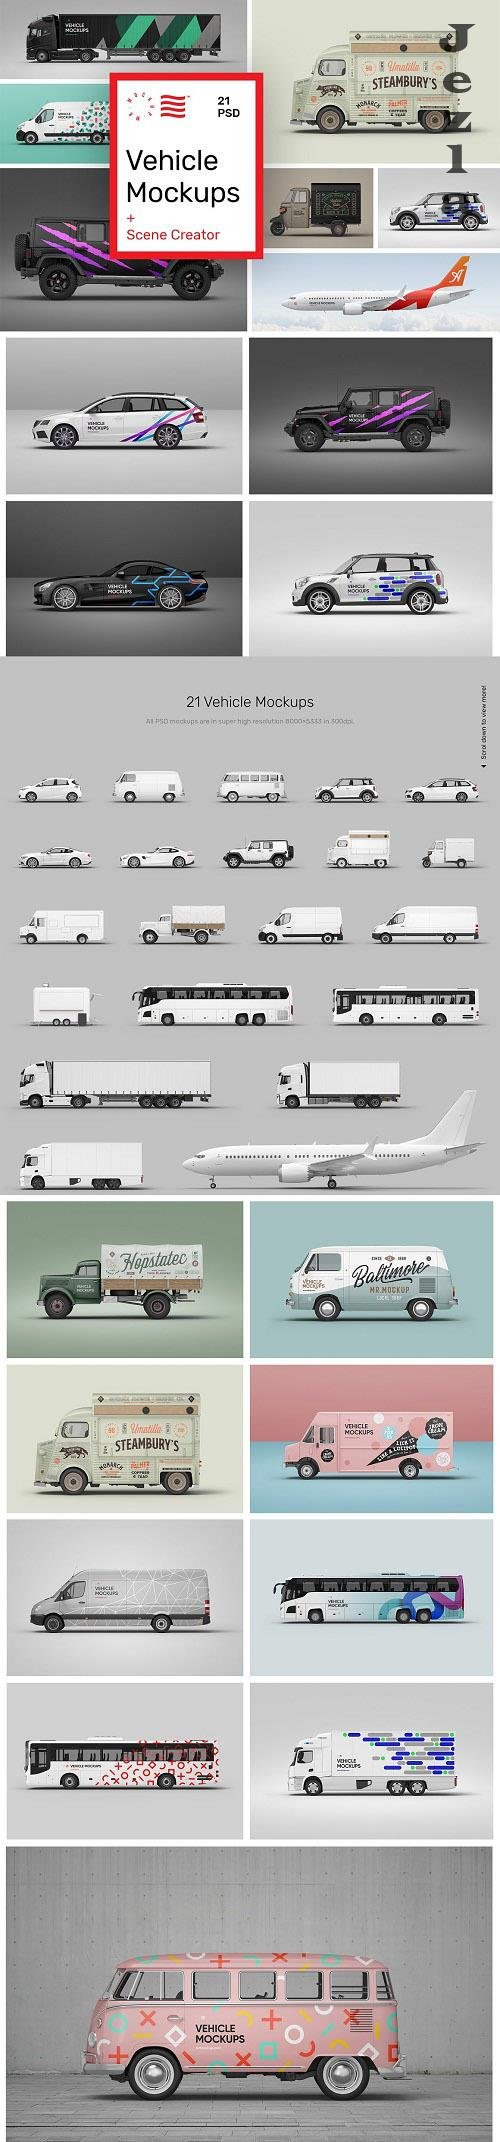 Vehicle Mockups - Car Mockups - 5933647